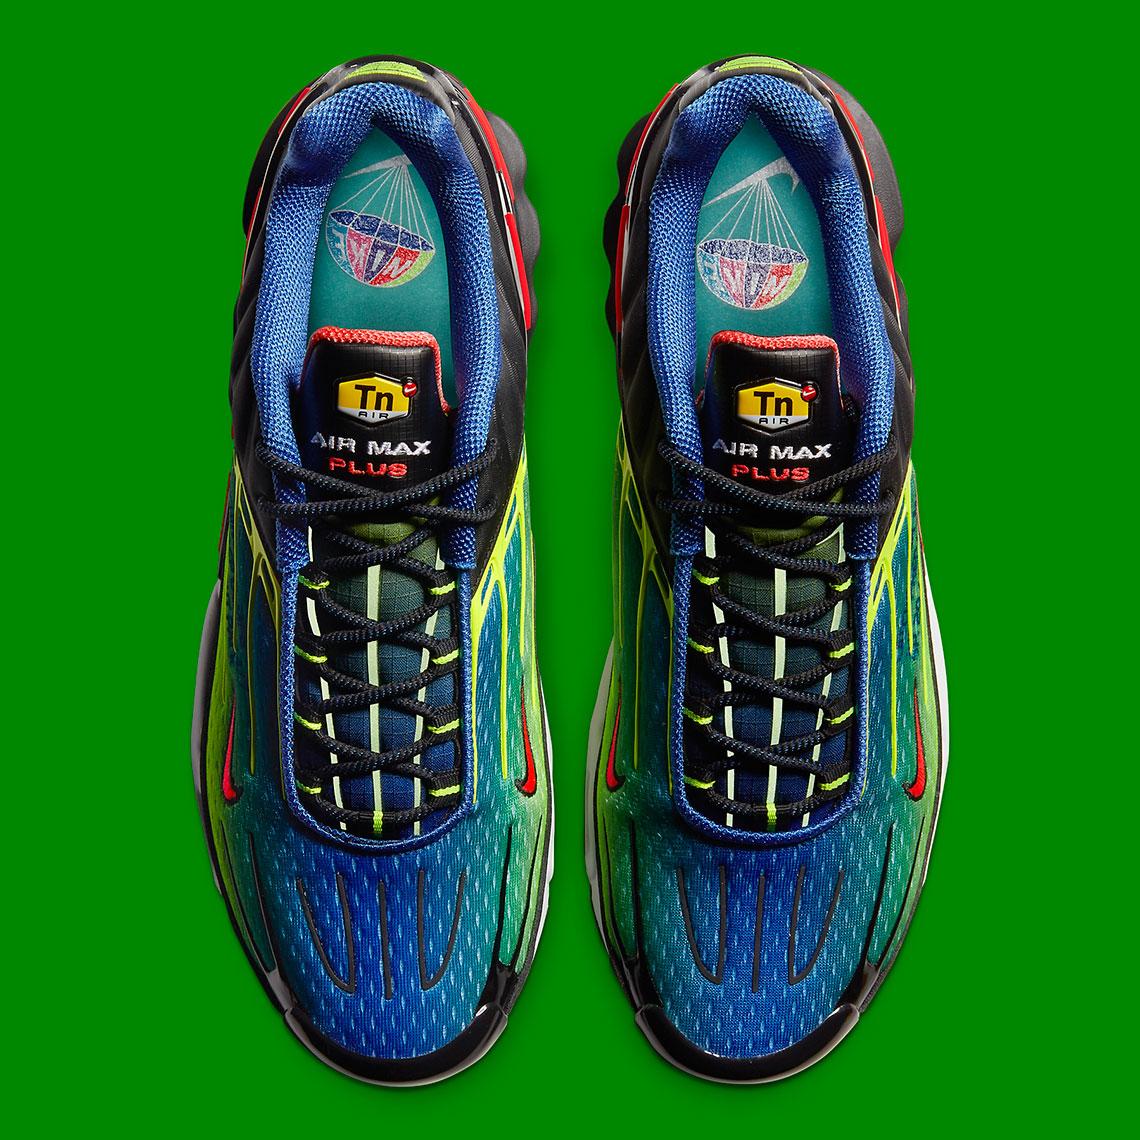 Nike Air Max Plus 3 Parachute Vert CU4710-400 - Crumpe